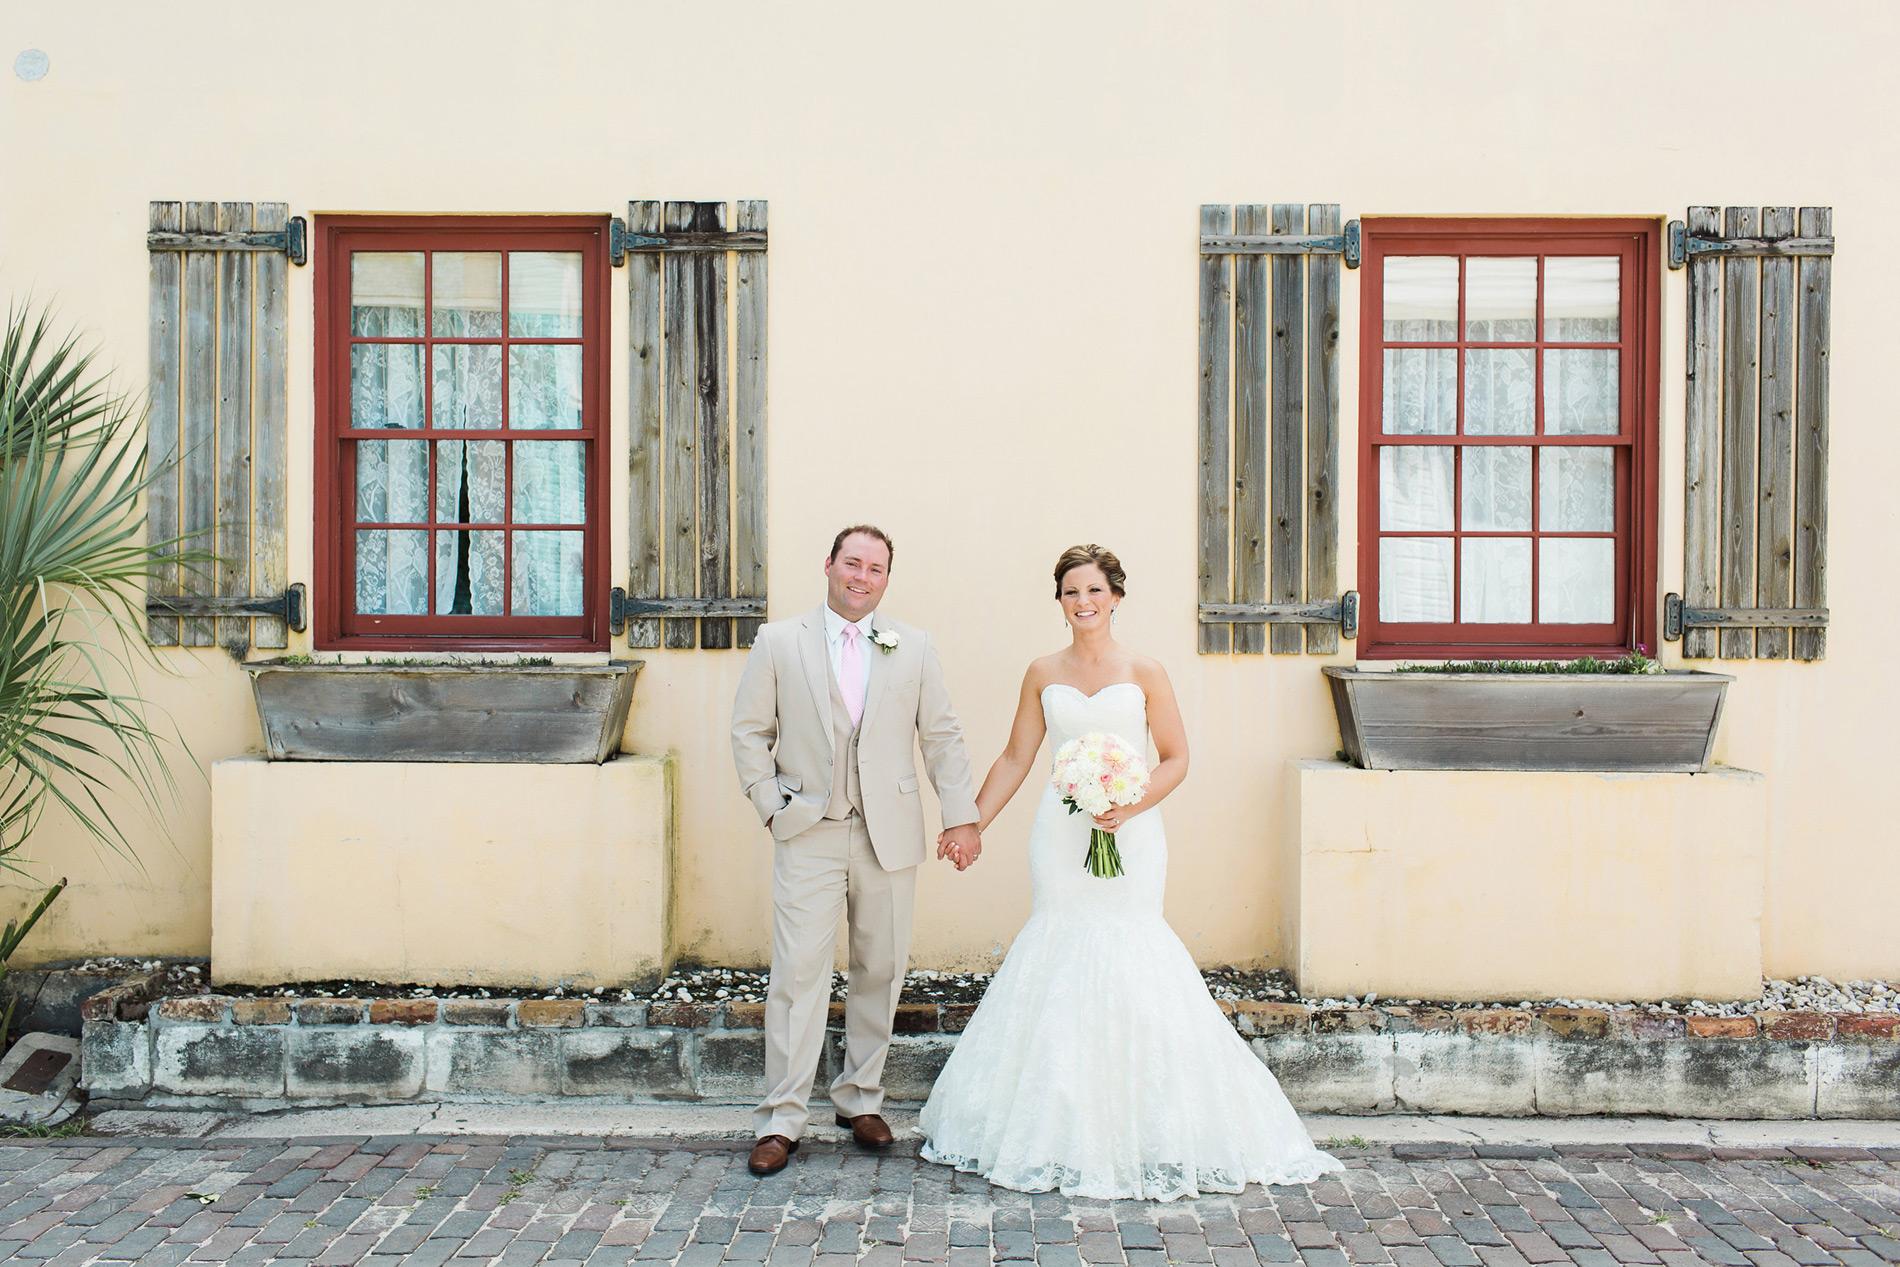 st-augustine-wedding-white-room-historic-streets